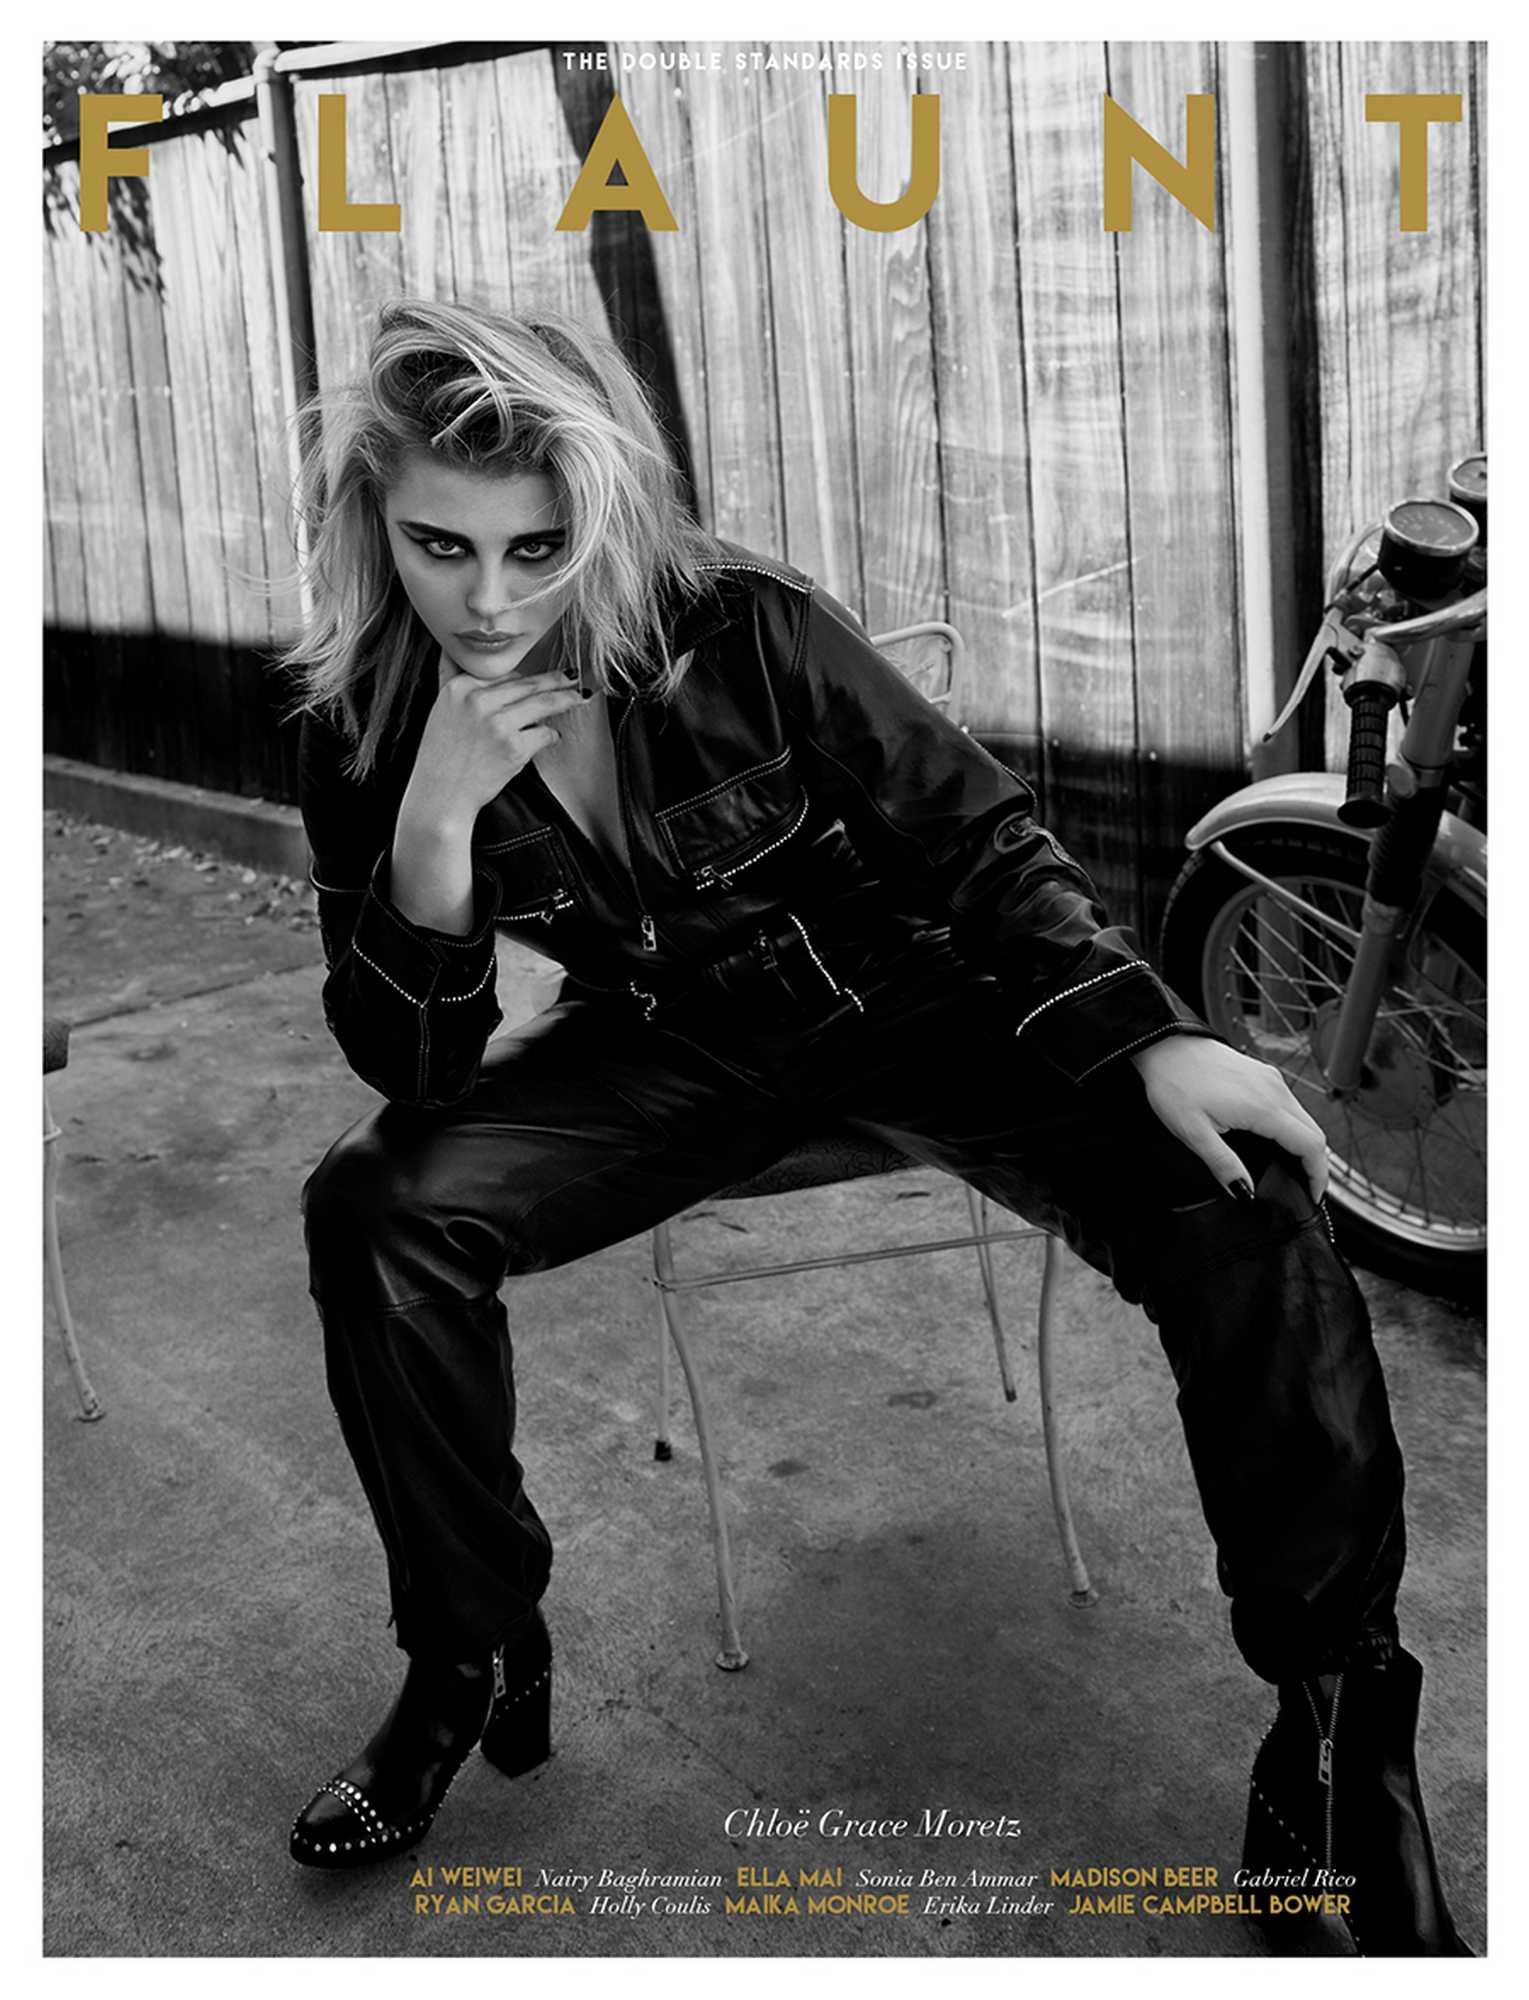 Chloe-Moretz-Frederic-Auerbach-for-Flaunt-Magazine-Issue-162-October-2018opusreps-image-162coverresizedjpg-5bb4f7a681021.jpg